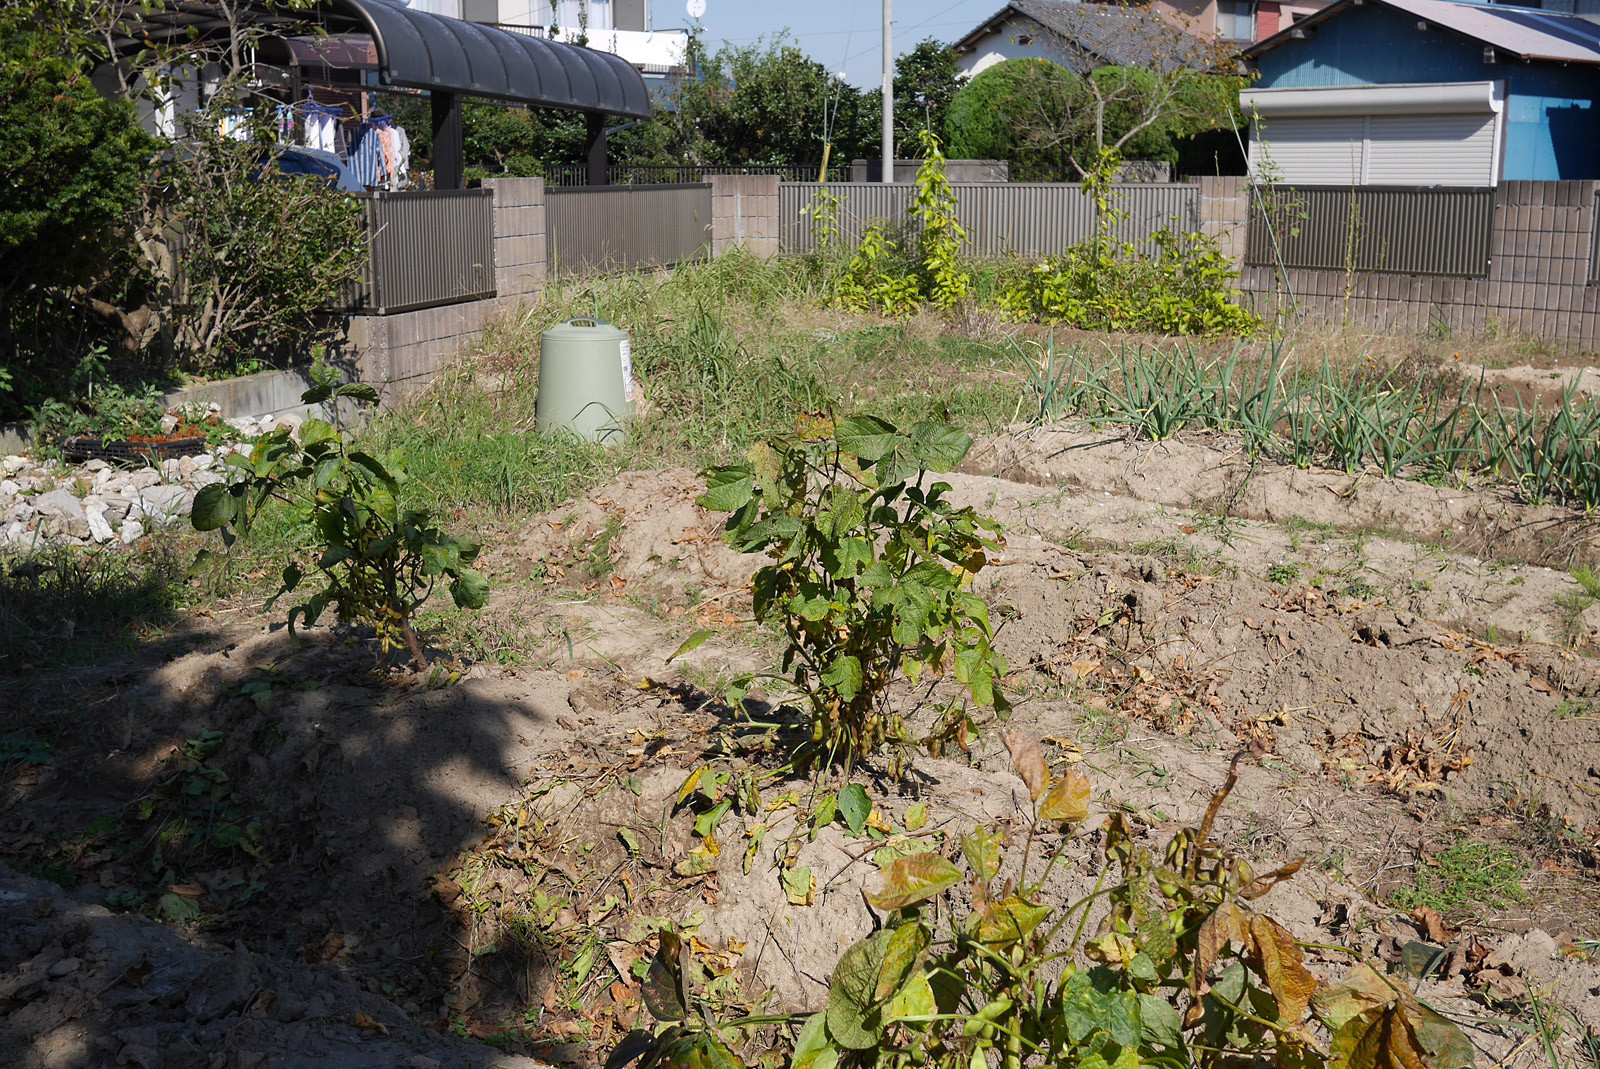 [Clg100] 菜園第3期、はじまってます